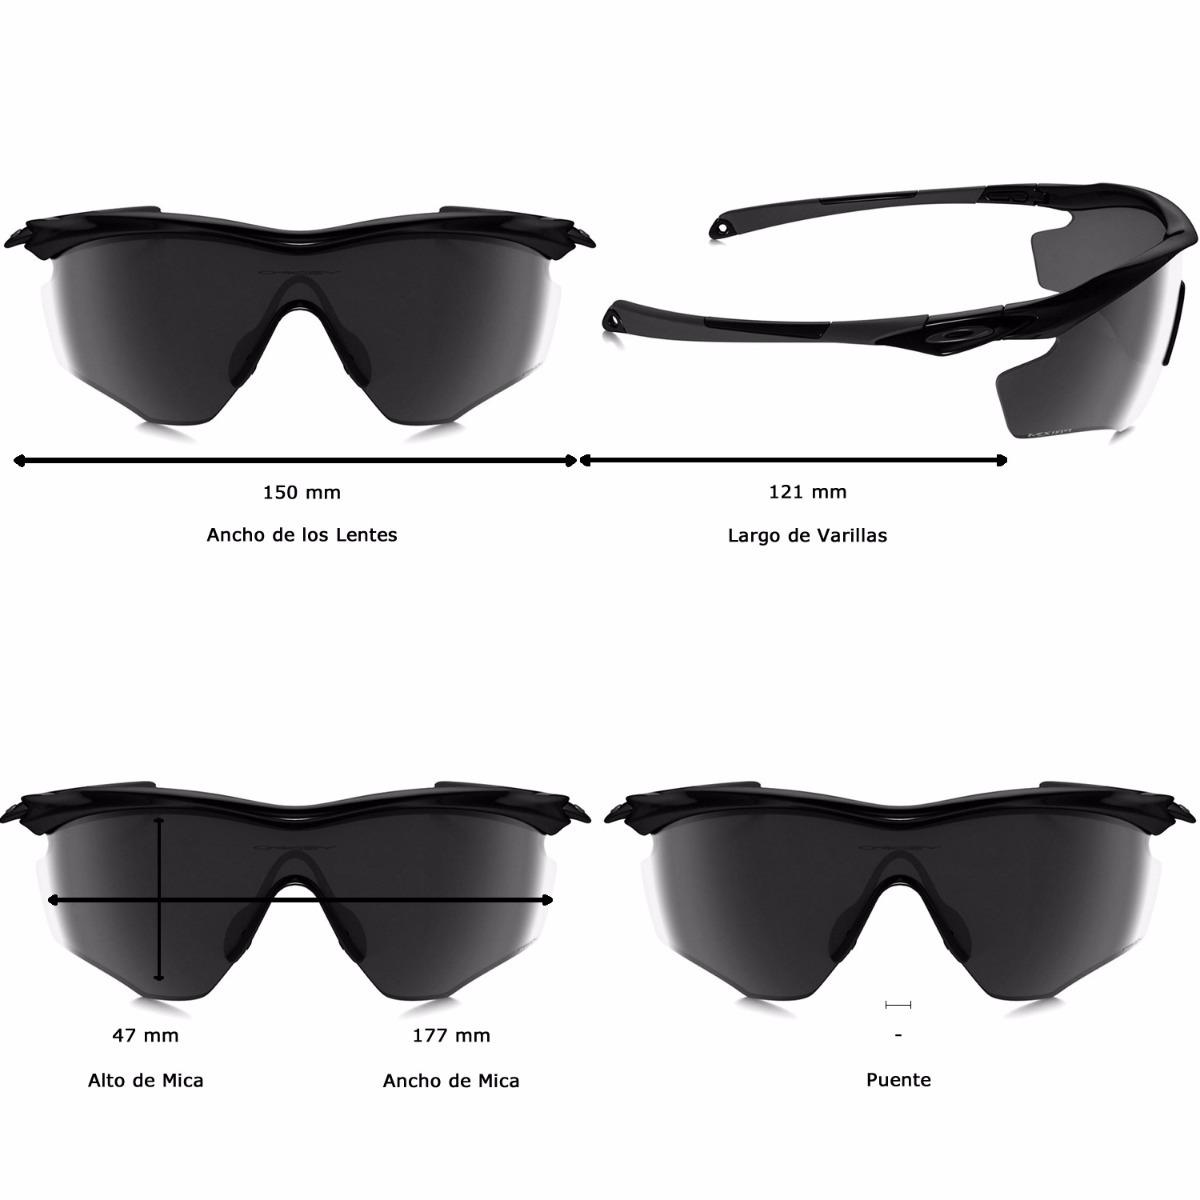 2f36e3344e lentes oakley m2 frame xl polished black - grey oo9343-01. Cargando zoom.